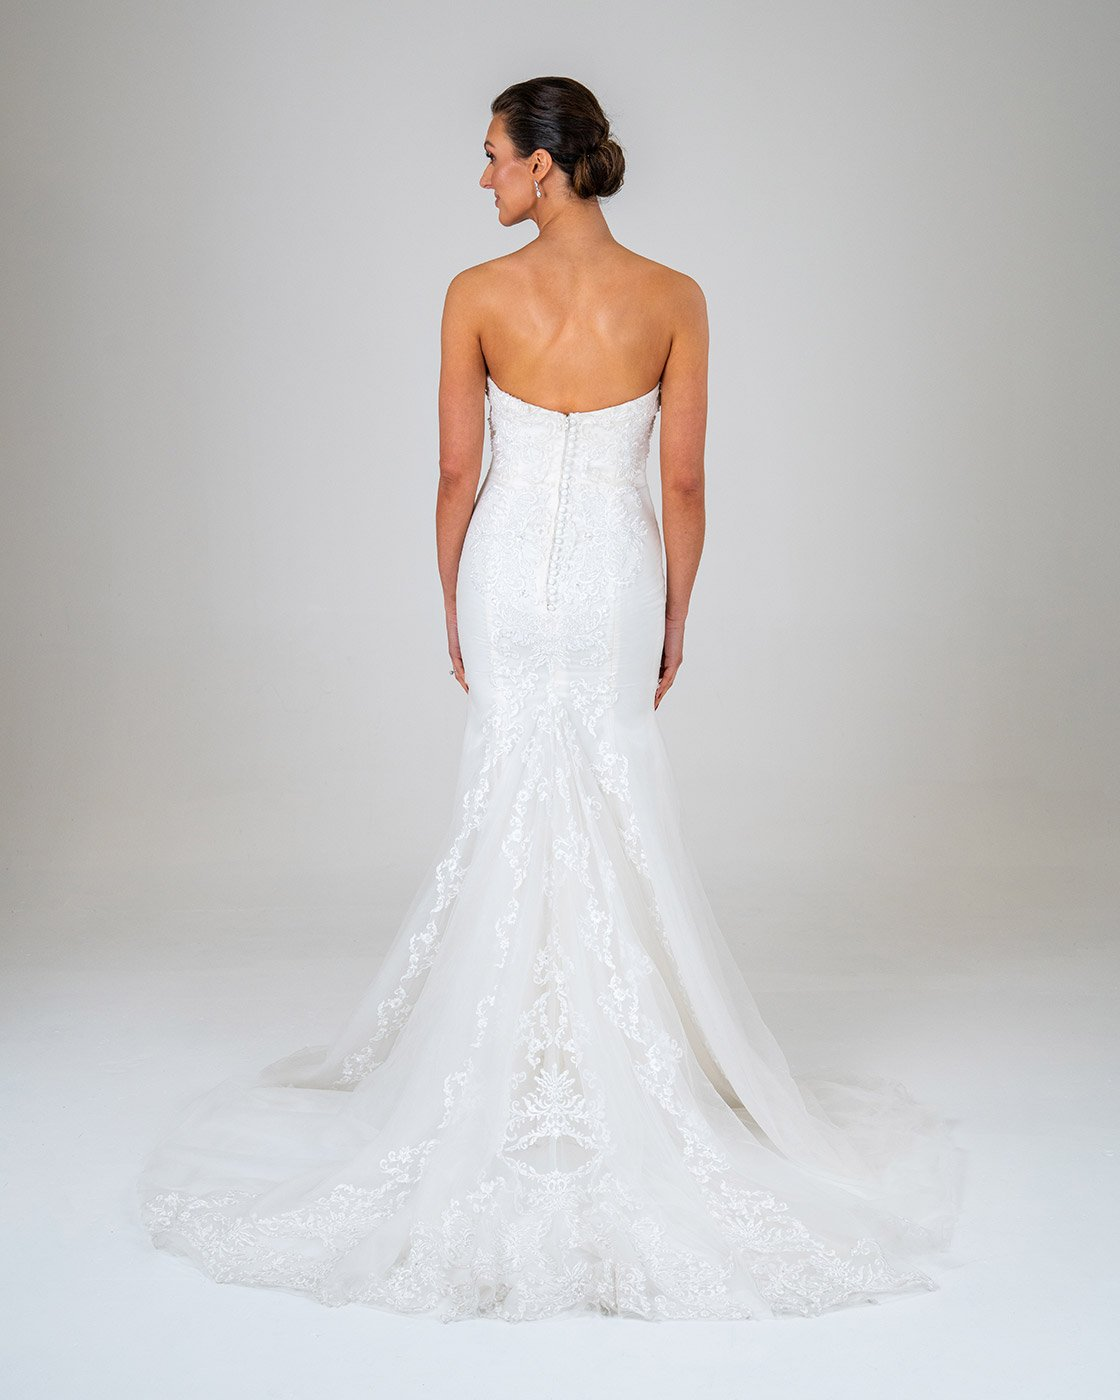 Florence wedding dress back